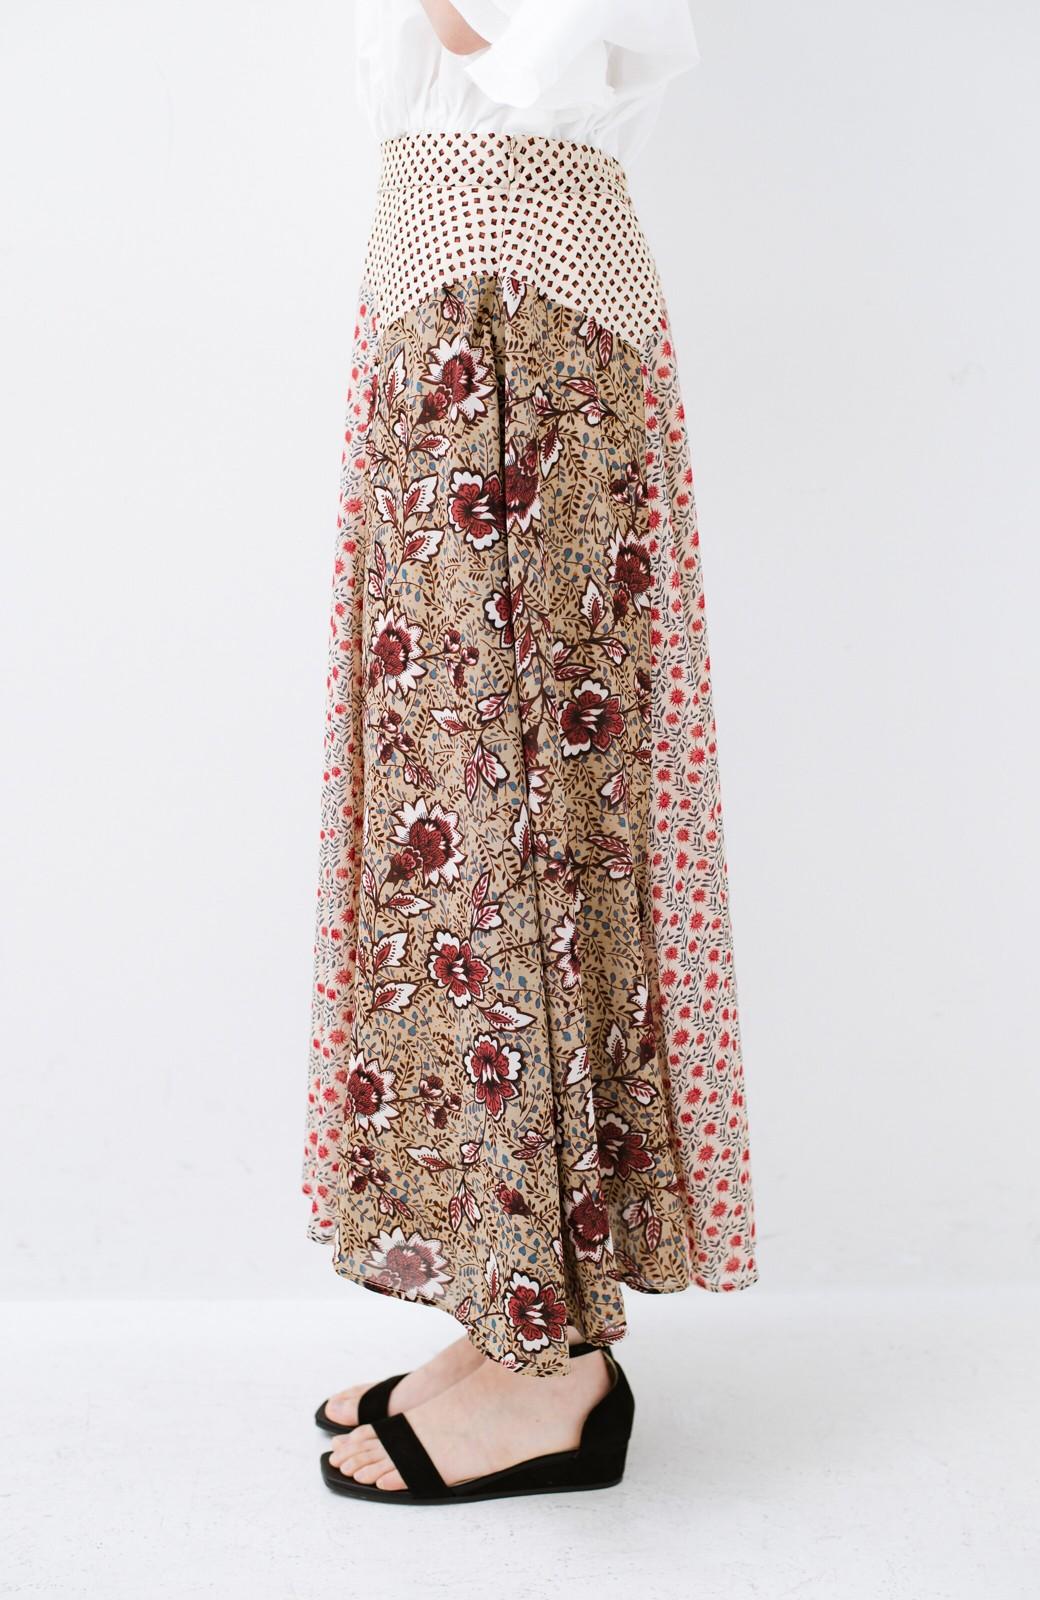 haco! 【洗濯機洗いOK】シンプルなトップスに合わせるだけでかわいくなれる MIX柄スカート <ベージュ系その他>の商品写真11